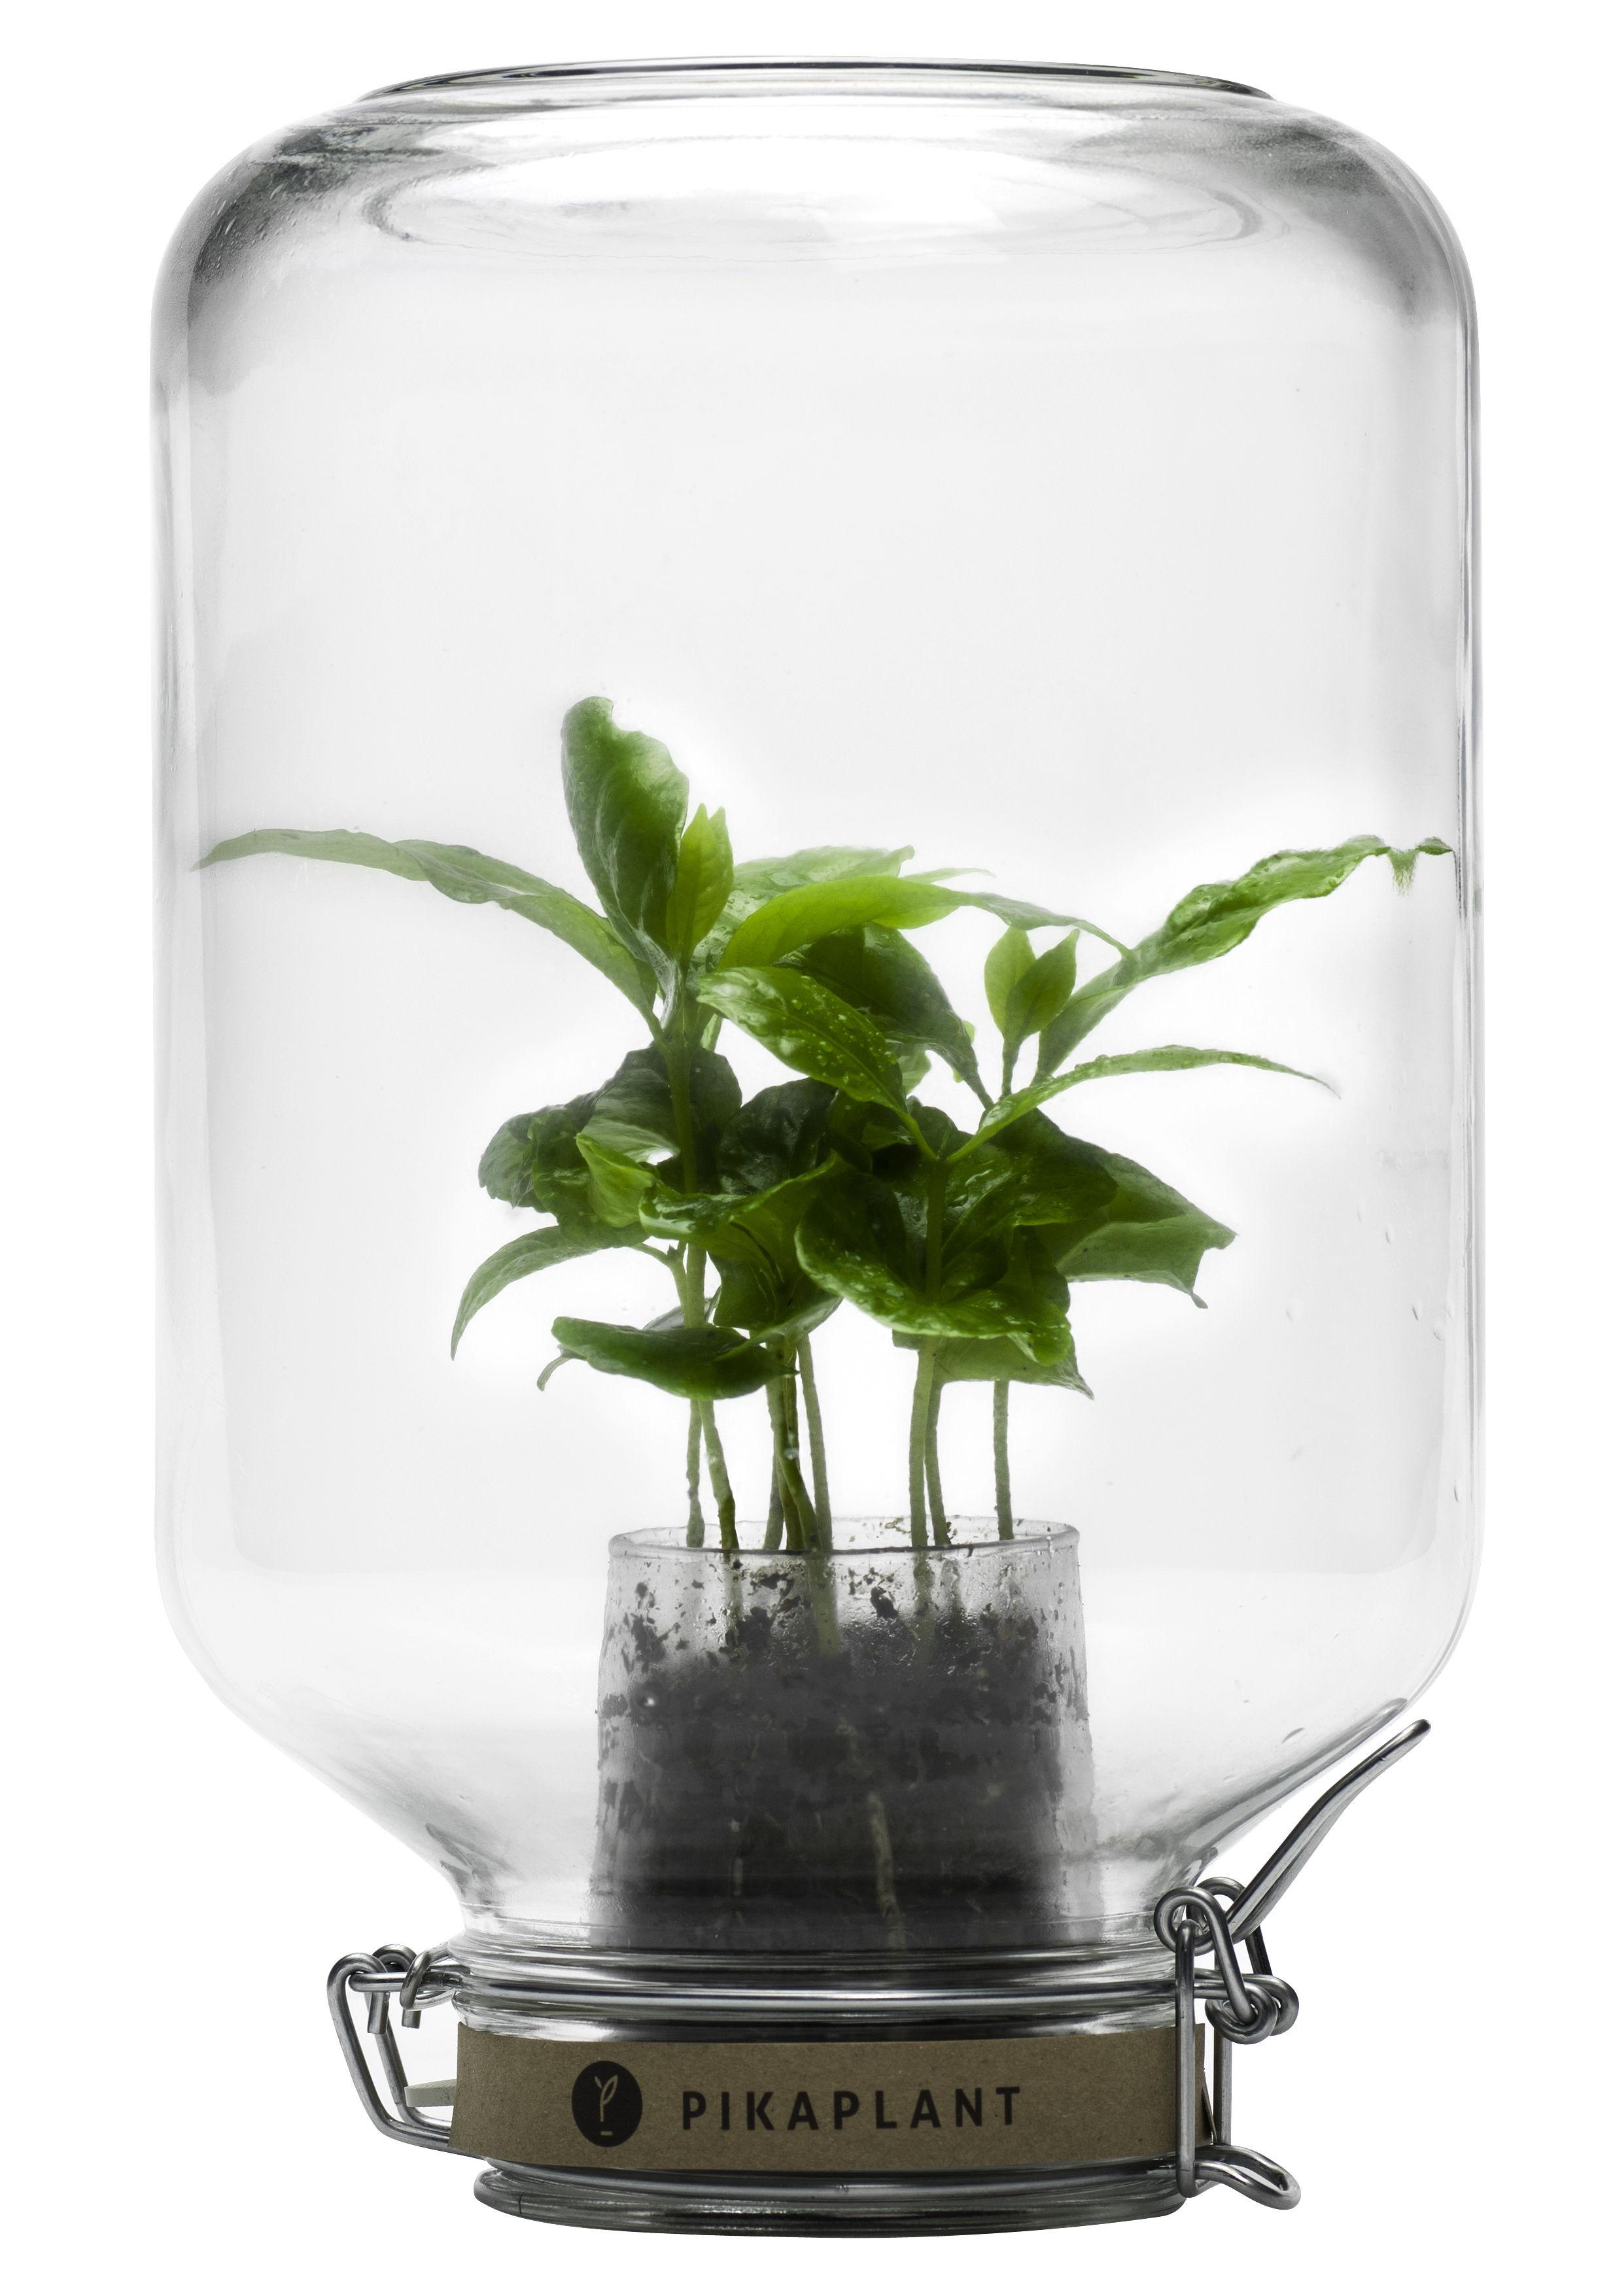 serre autonome jar mini caf ier inclus h 28 cm caf ier transparent pikaplant. Black Bedroom Furniture Sets. Home Design Ideas